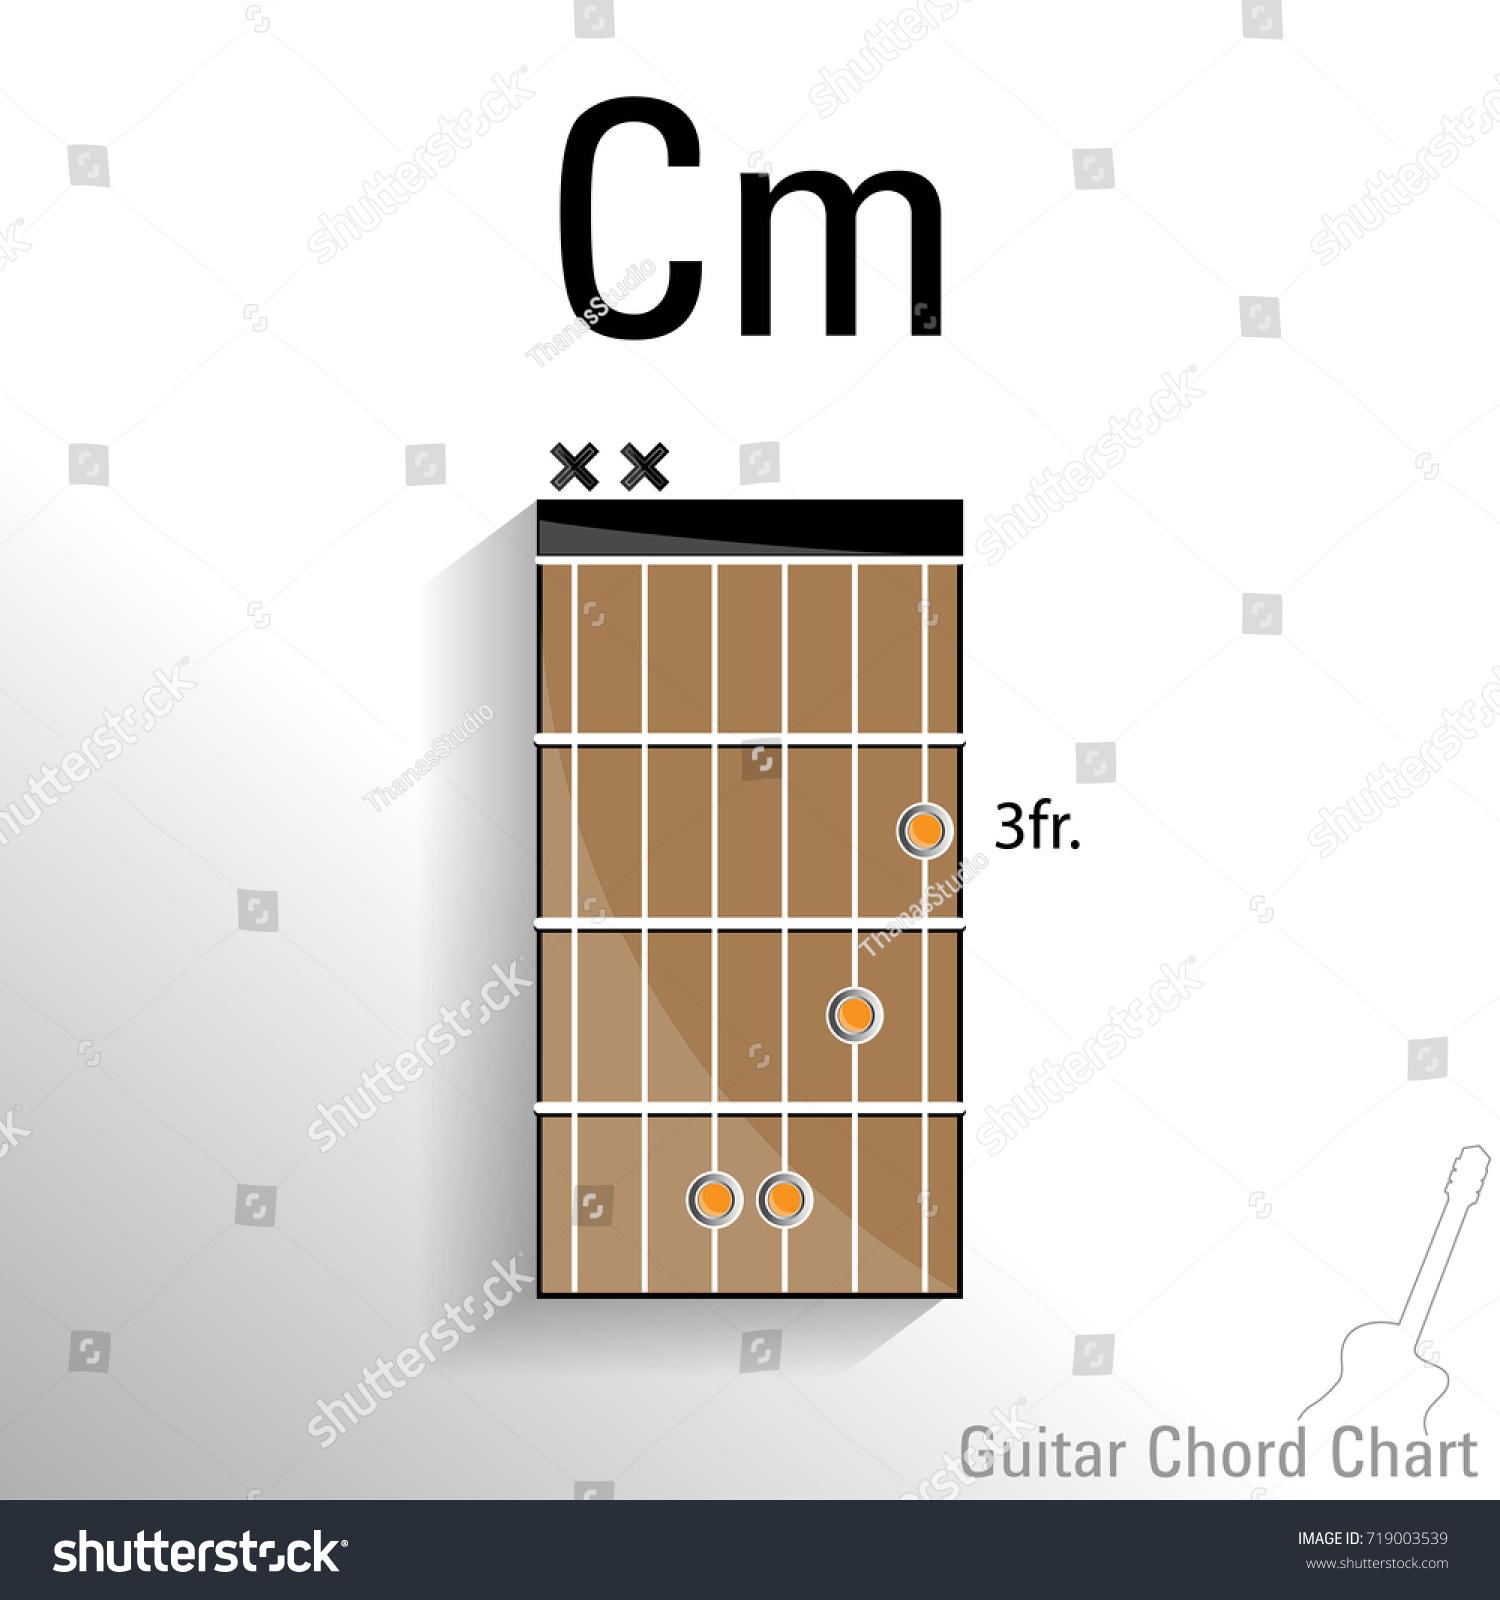 Guitar Chord Cm Chart Vector Design Stock Vector Royalty Free